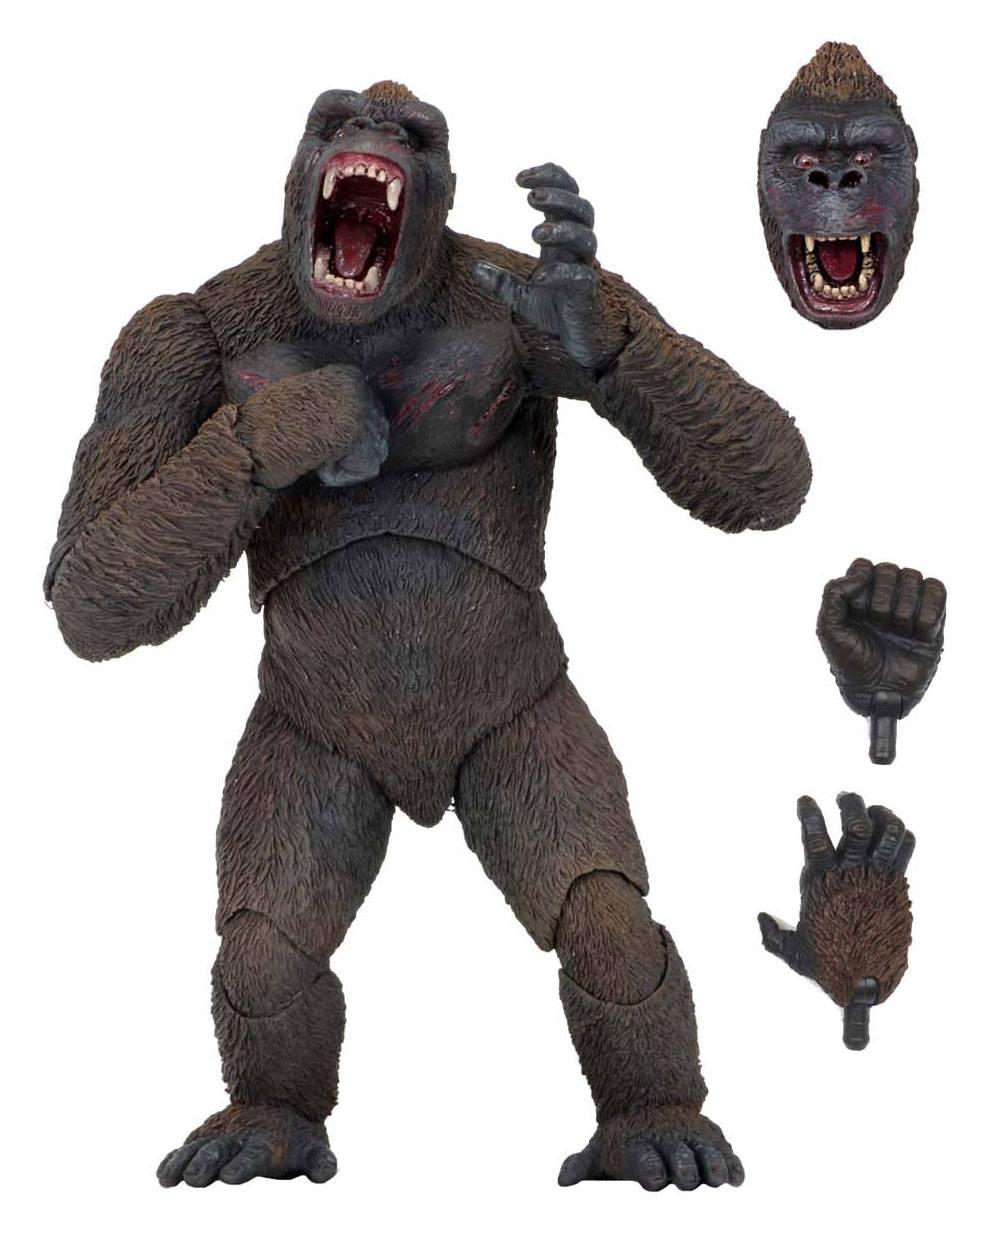 King Kong Action Figure 20 cm